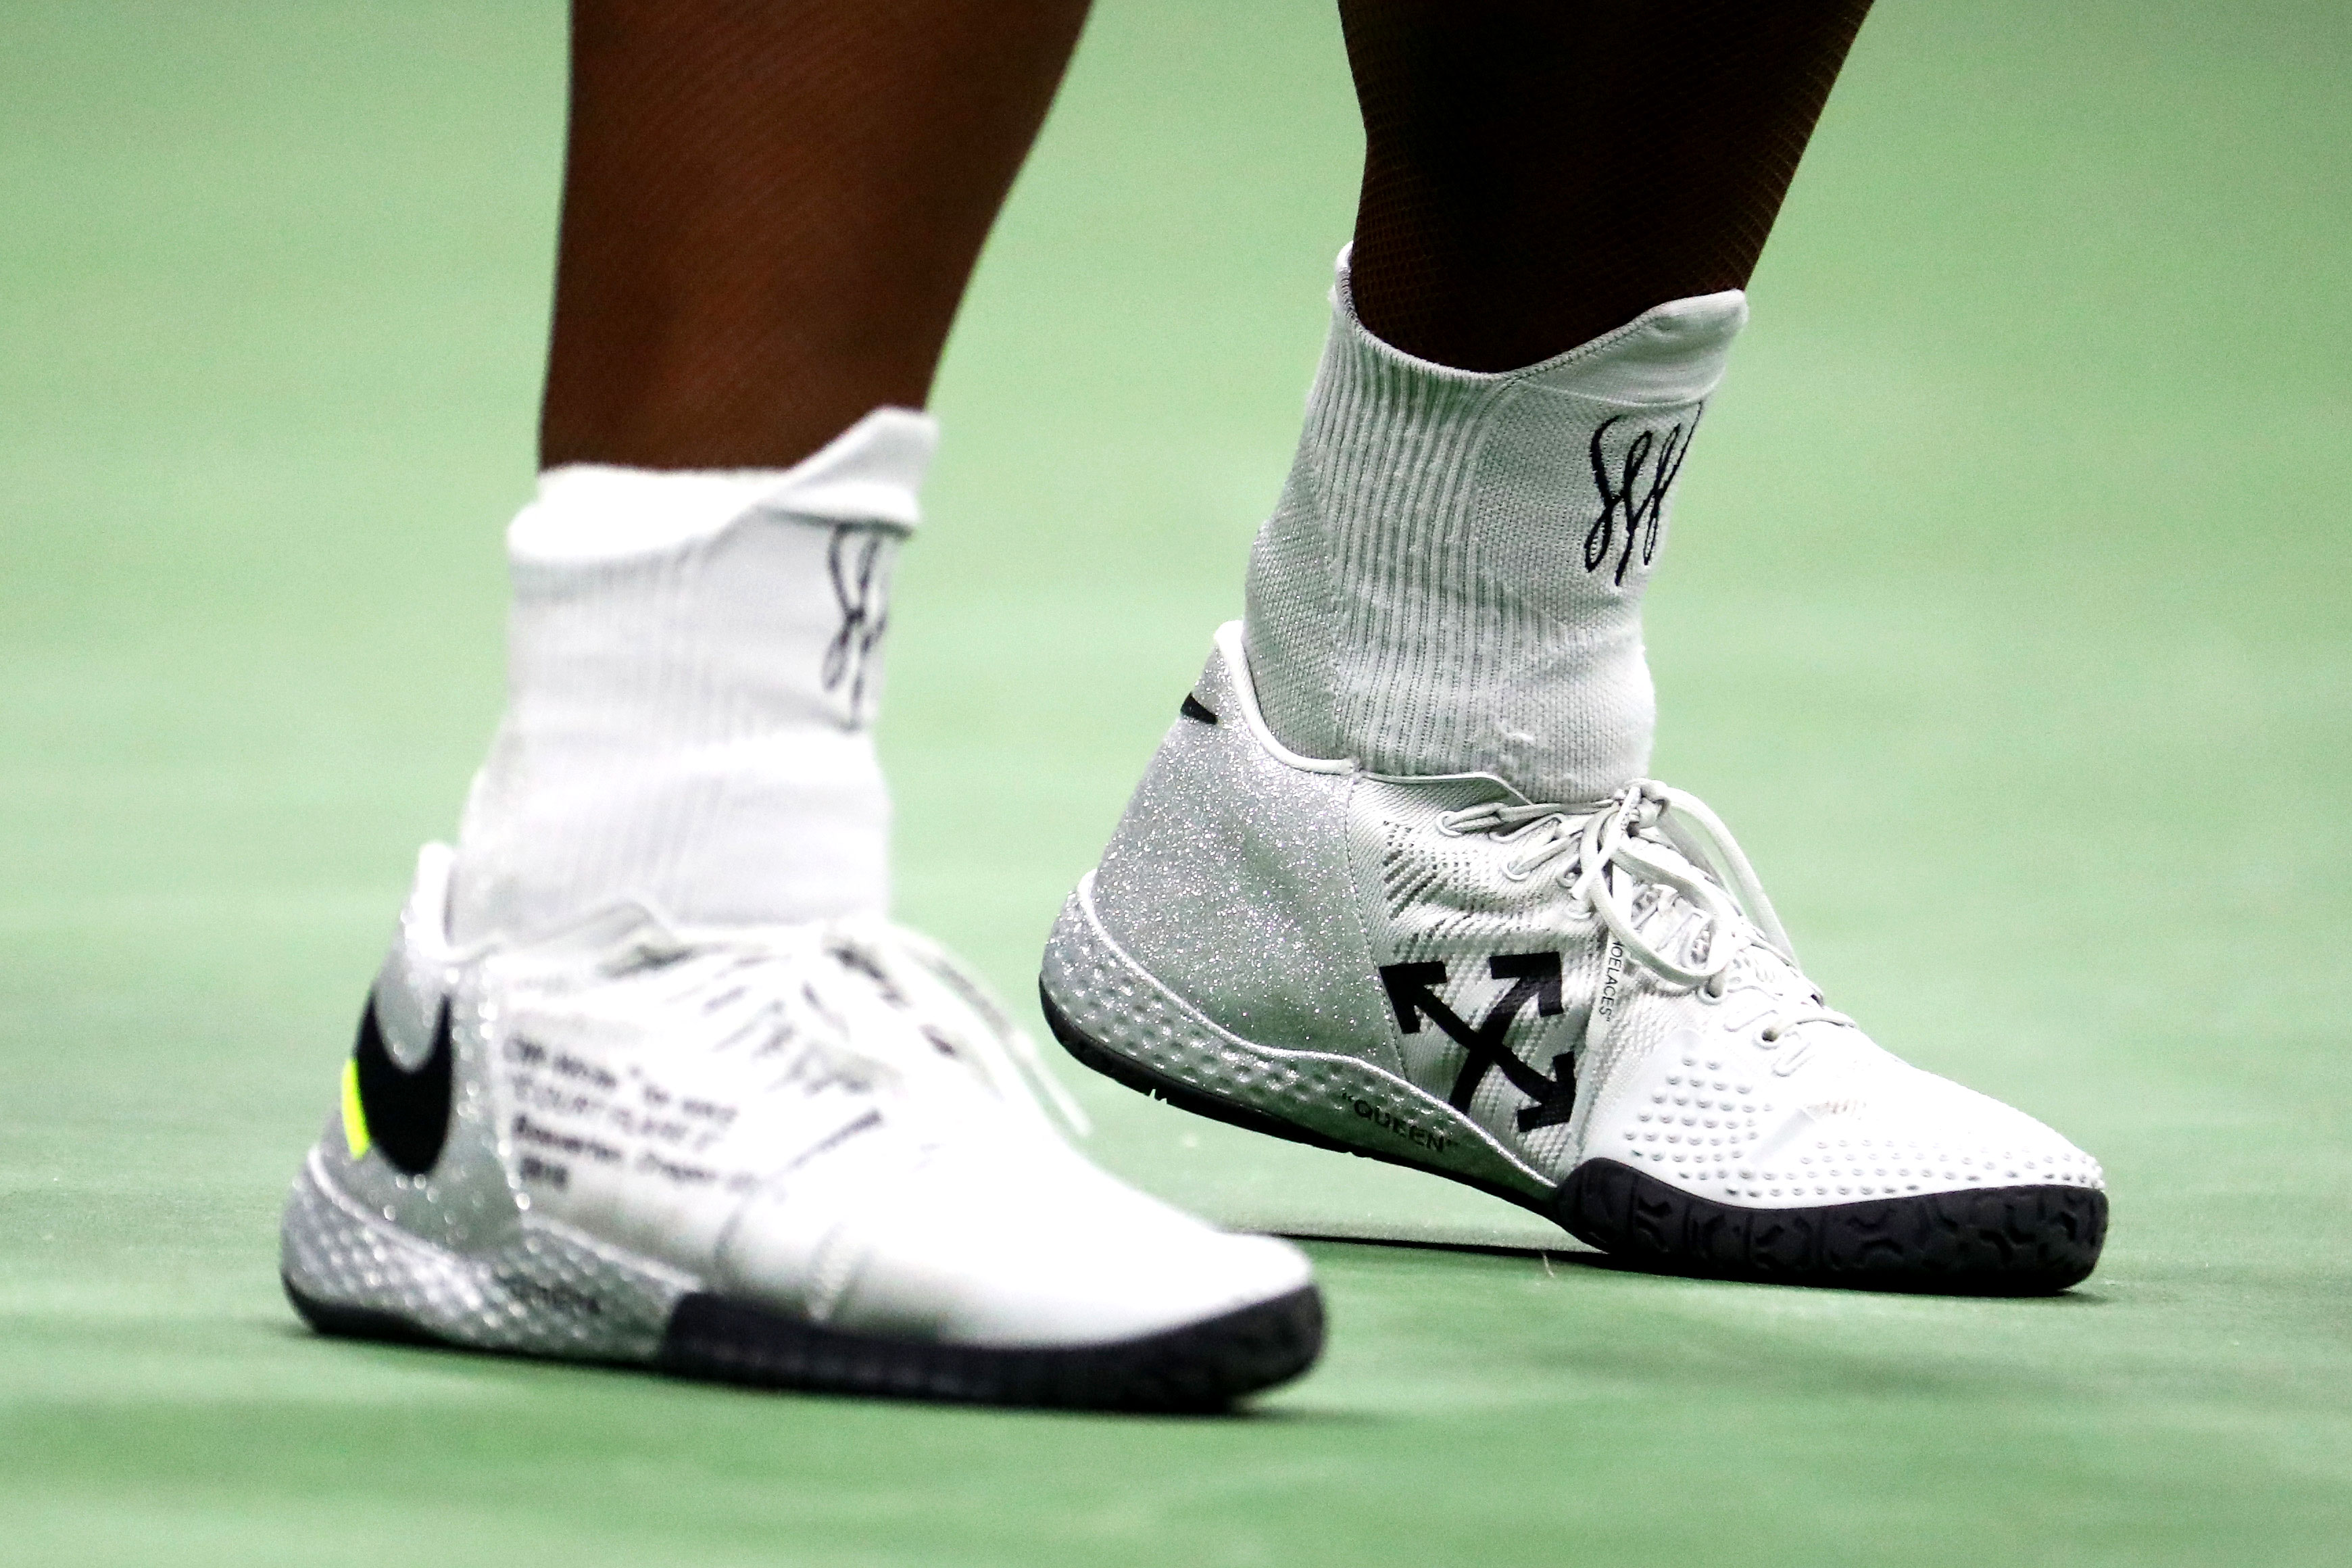 5b19534173fb Serena Williams  One-Shoulder Off-White x Nike 2018 U.S. Open Dress